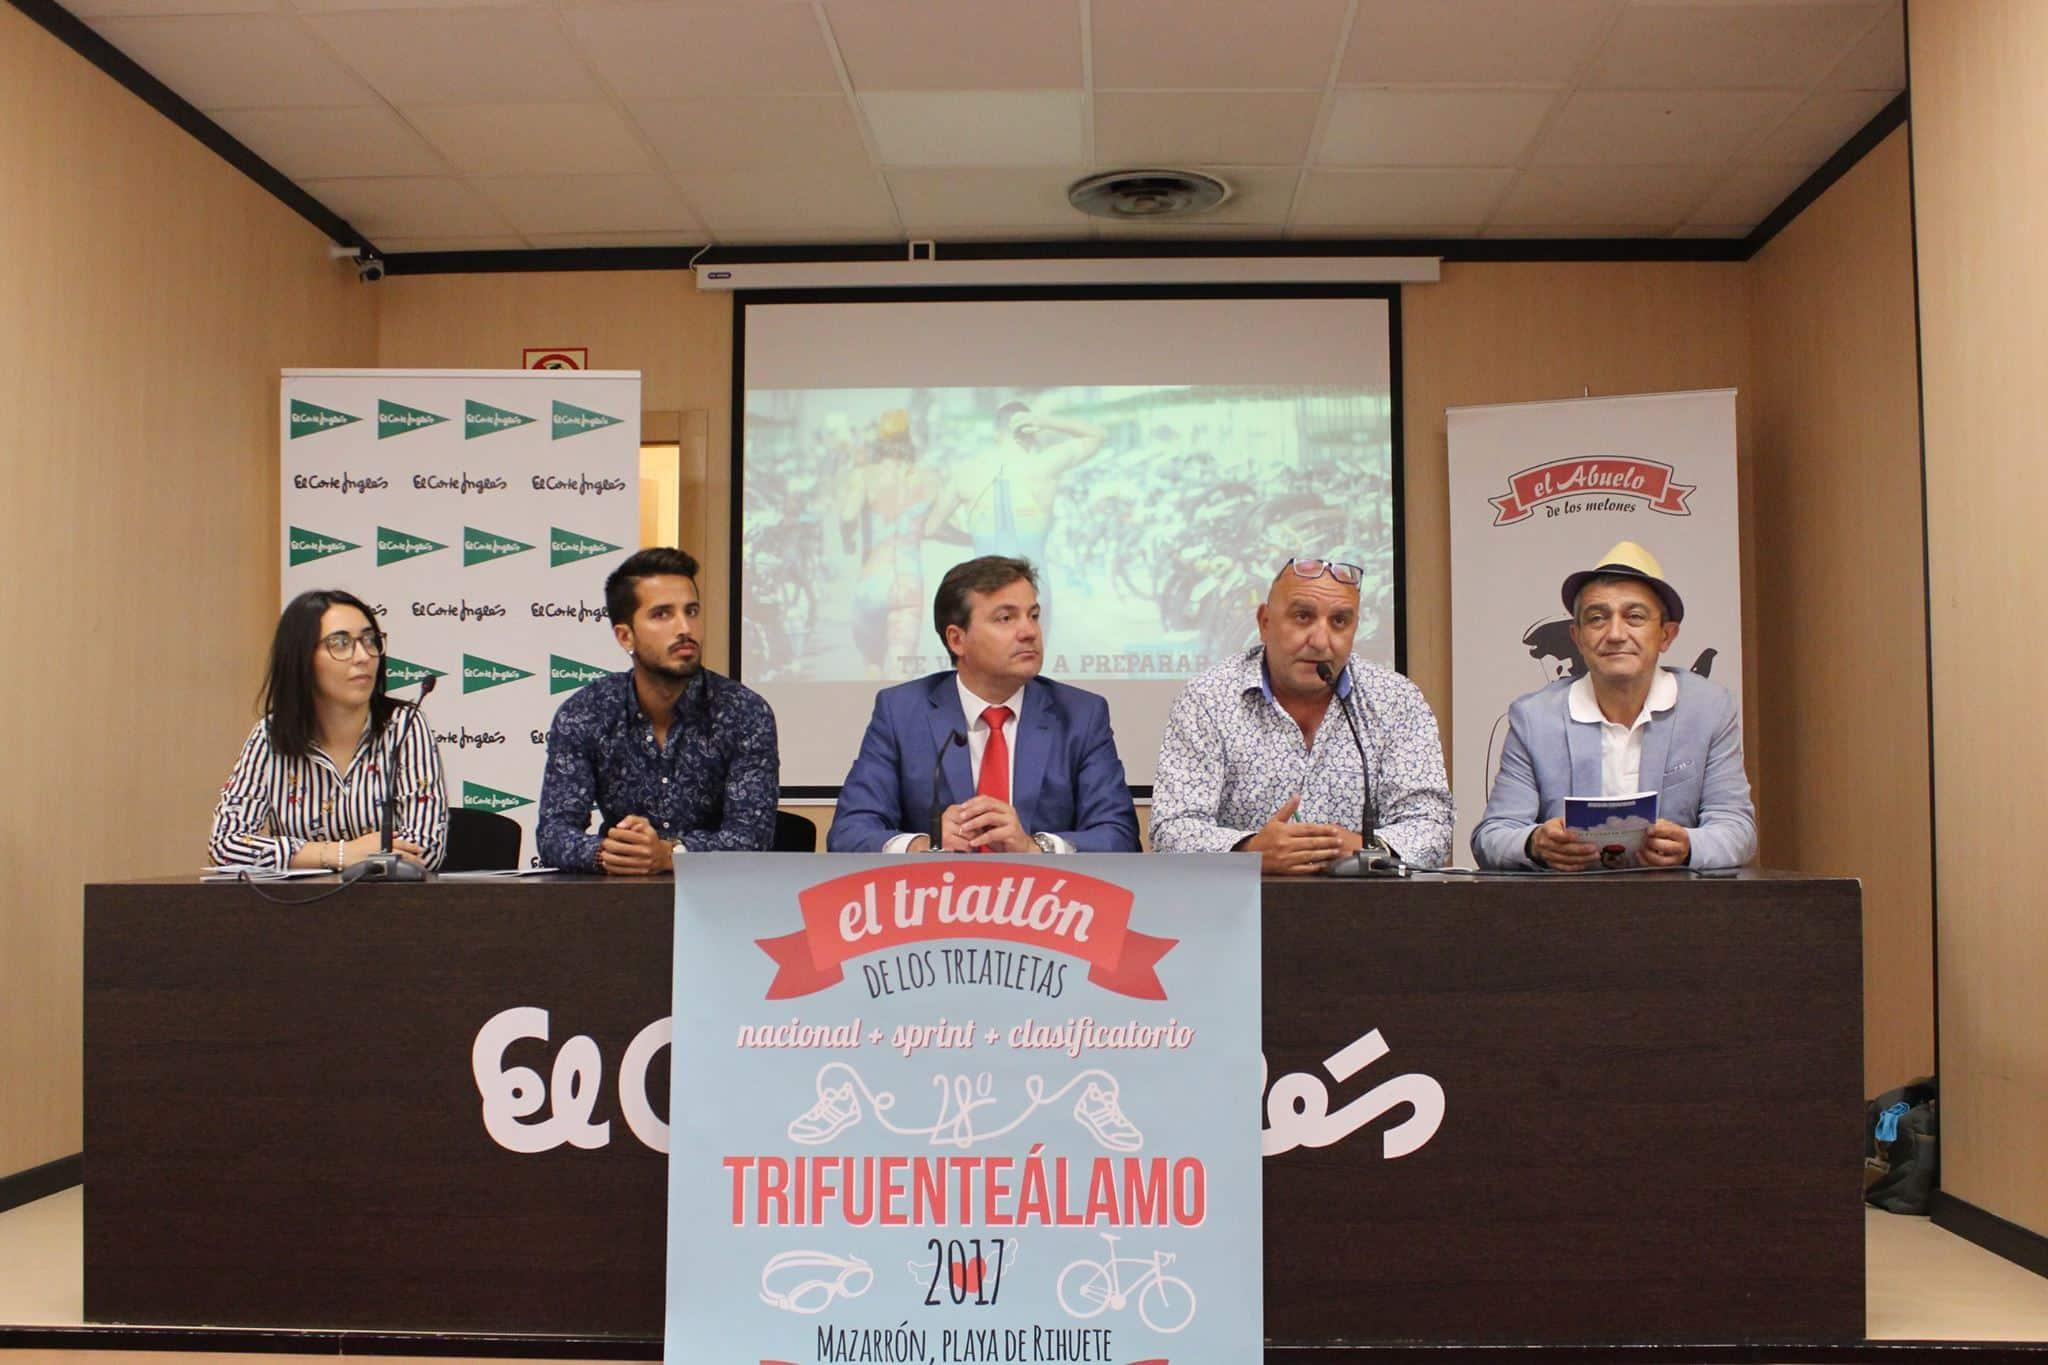 presentacion trifuentealamo 2017